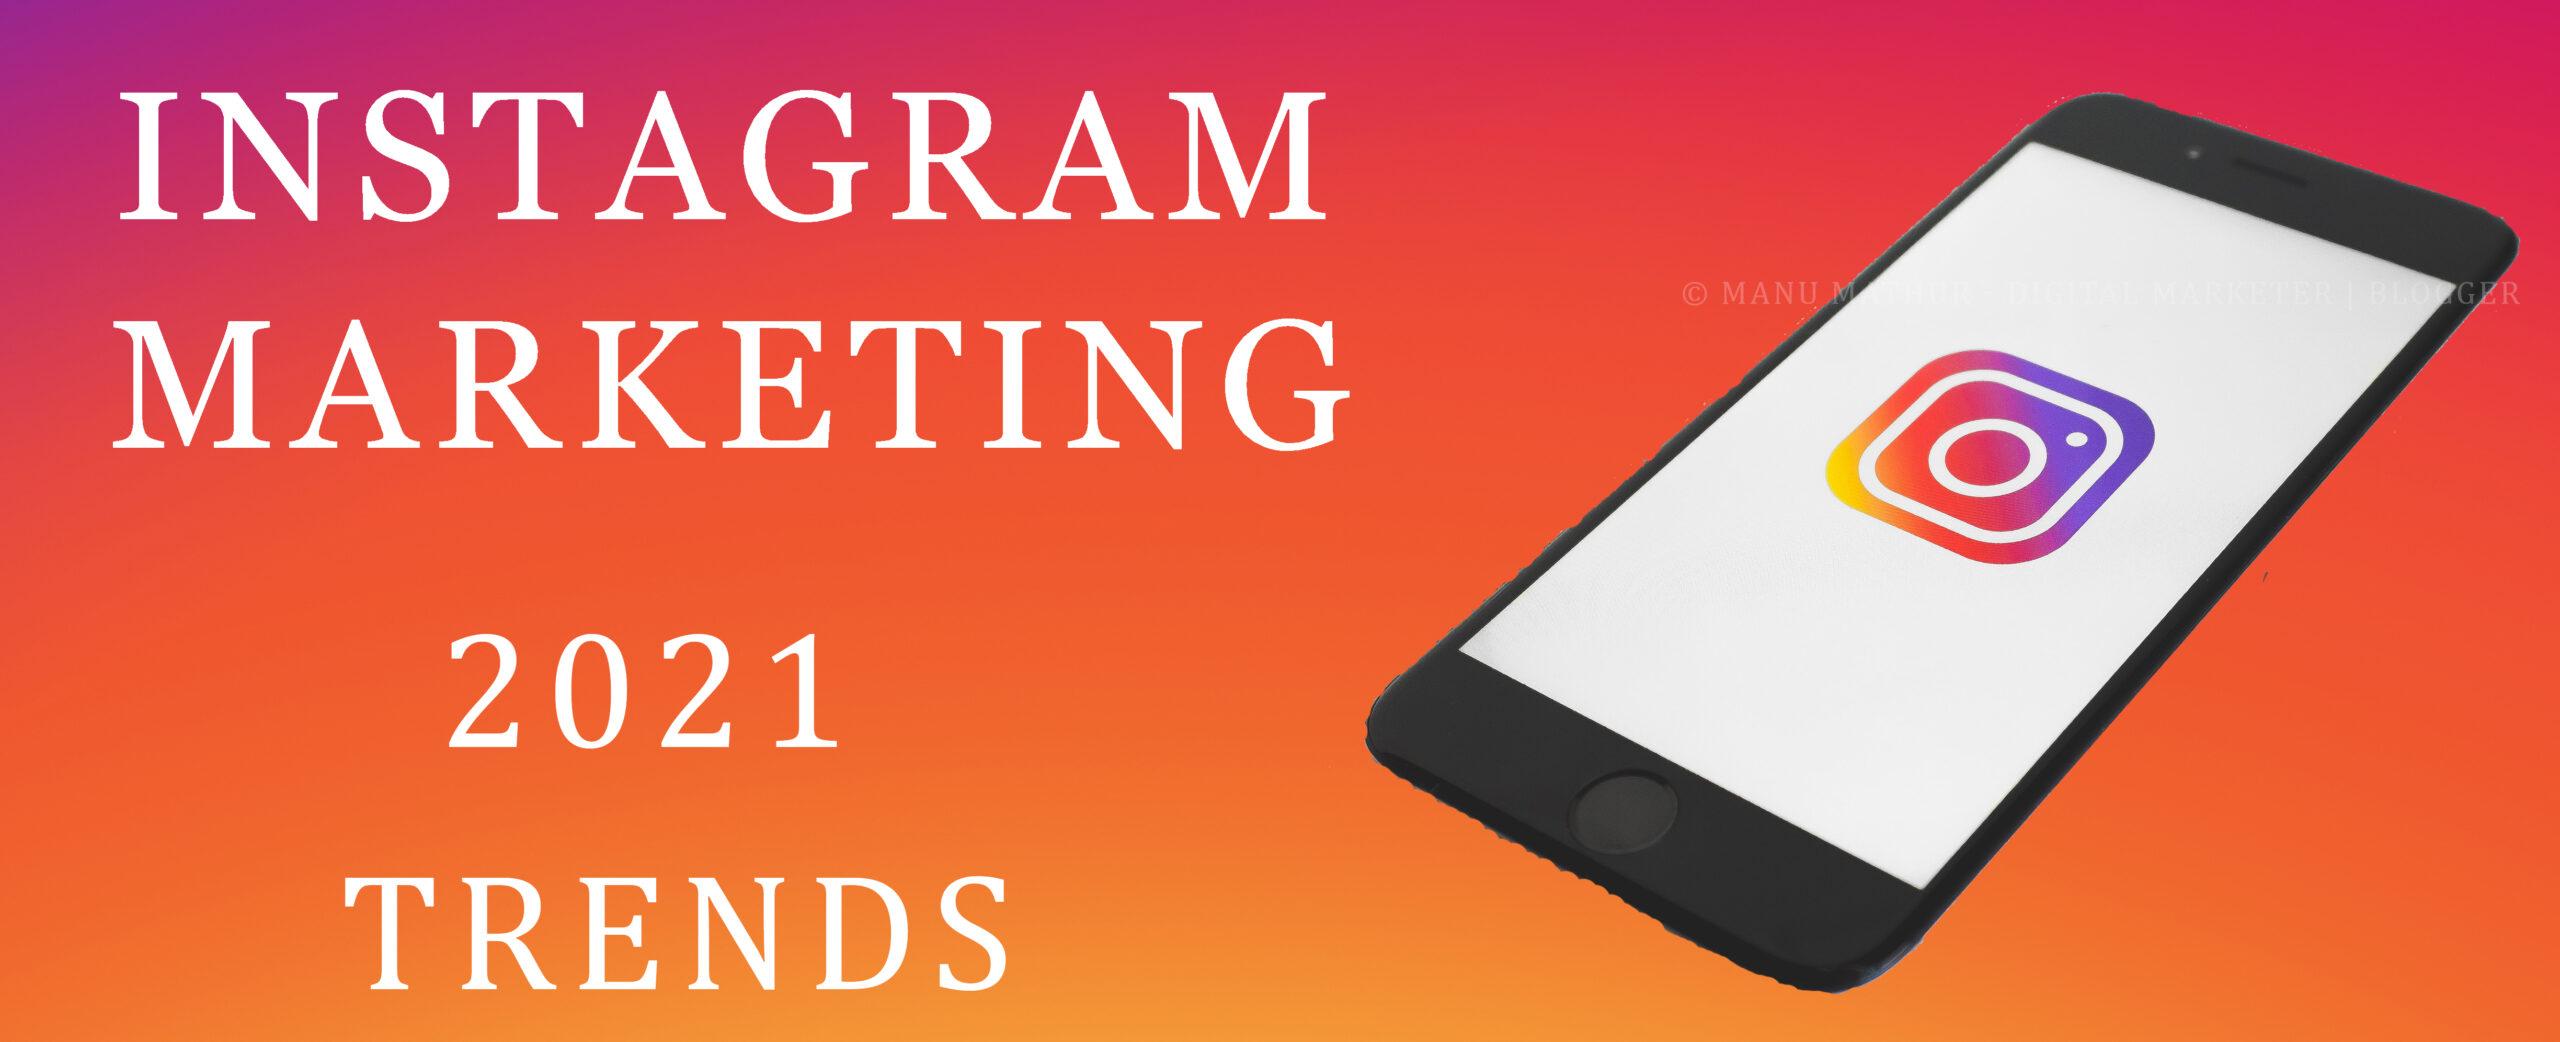 instagram-marketing-trends-2021